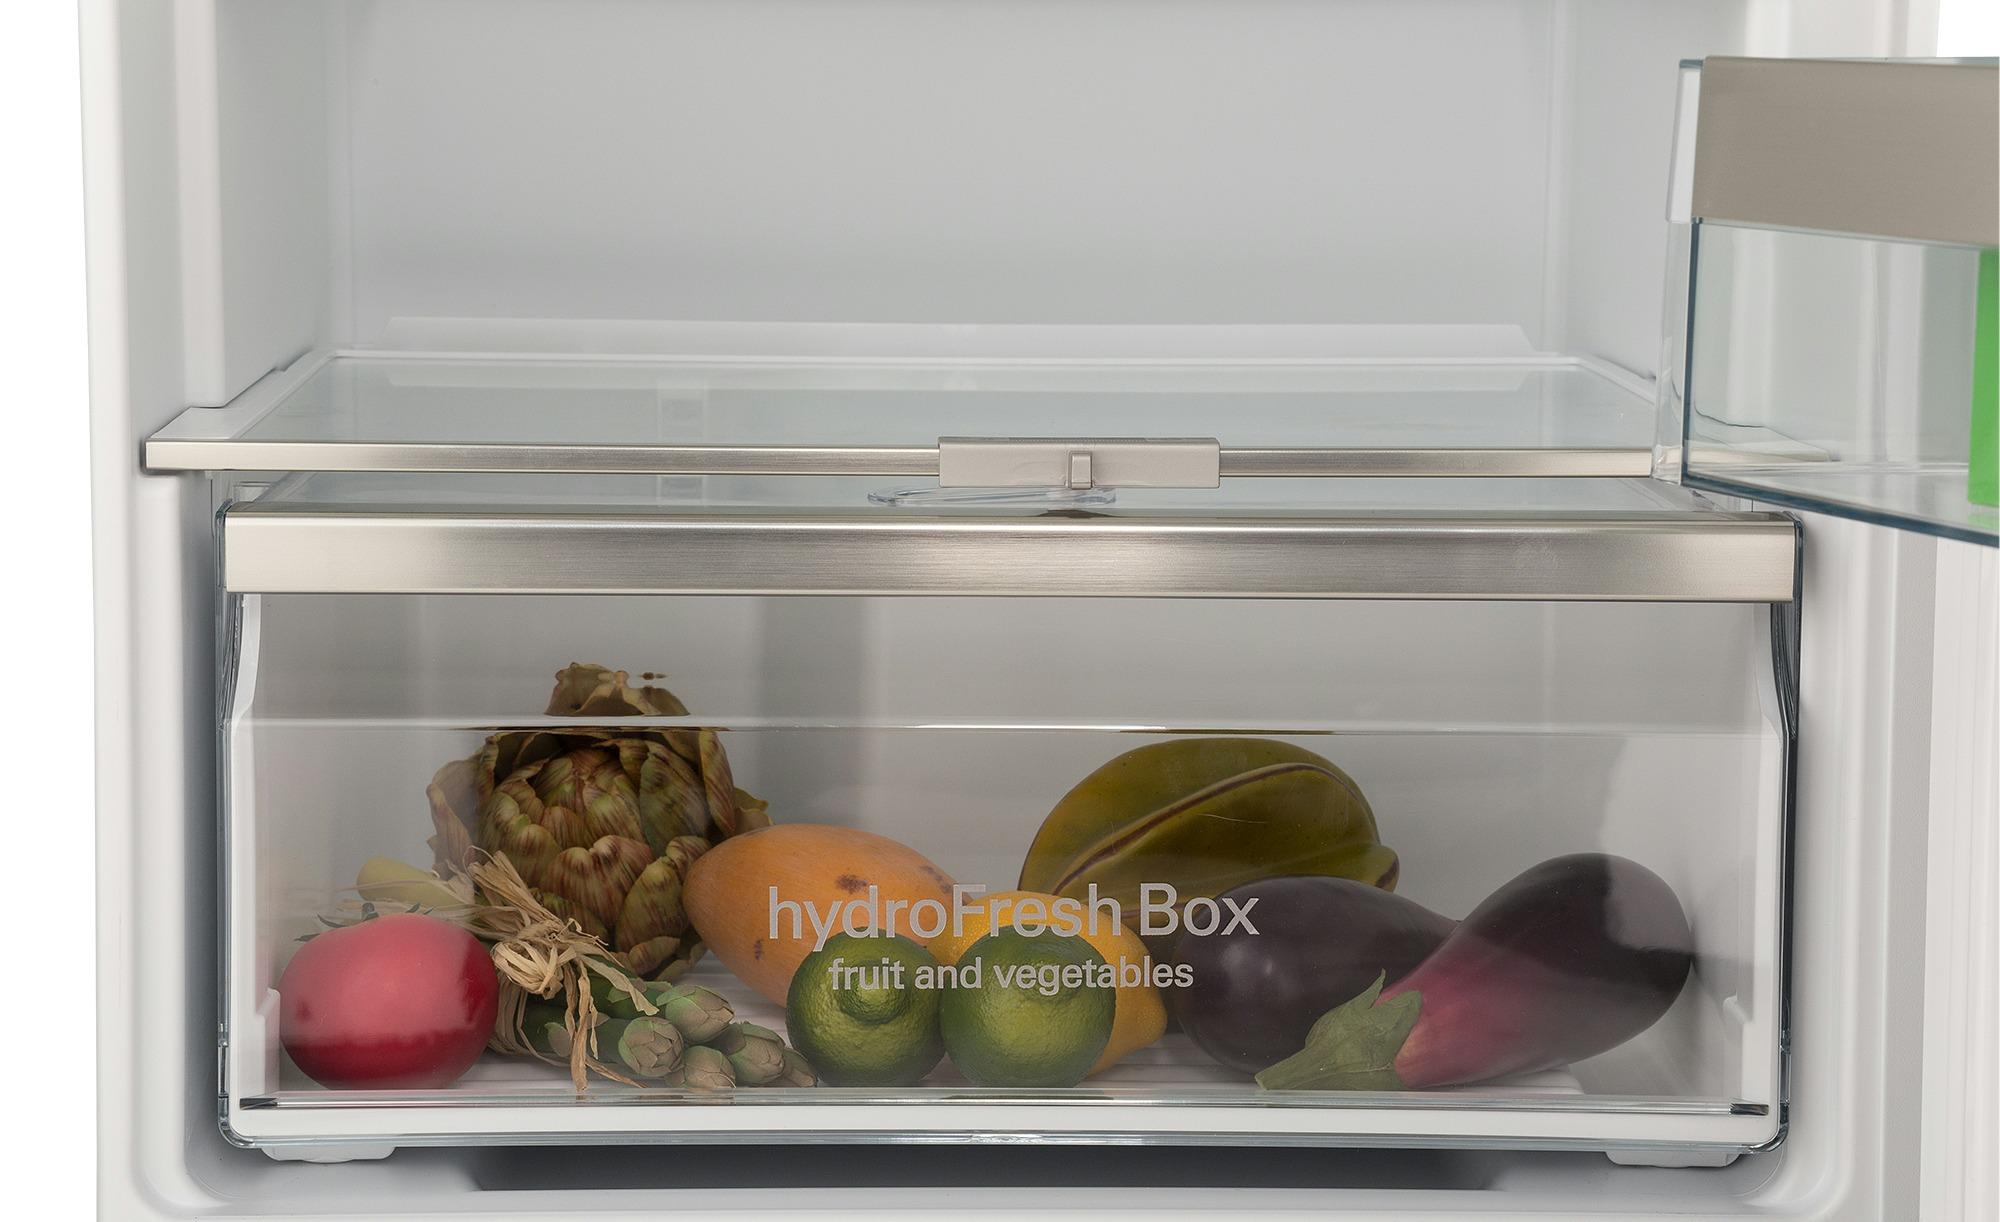 Siemens Kühlschrank Hydrofresh Box : Siemens einbau kühlschrank ki laf möbel höffner